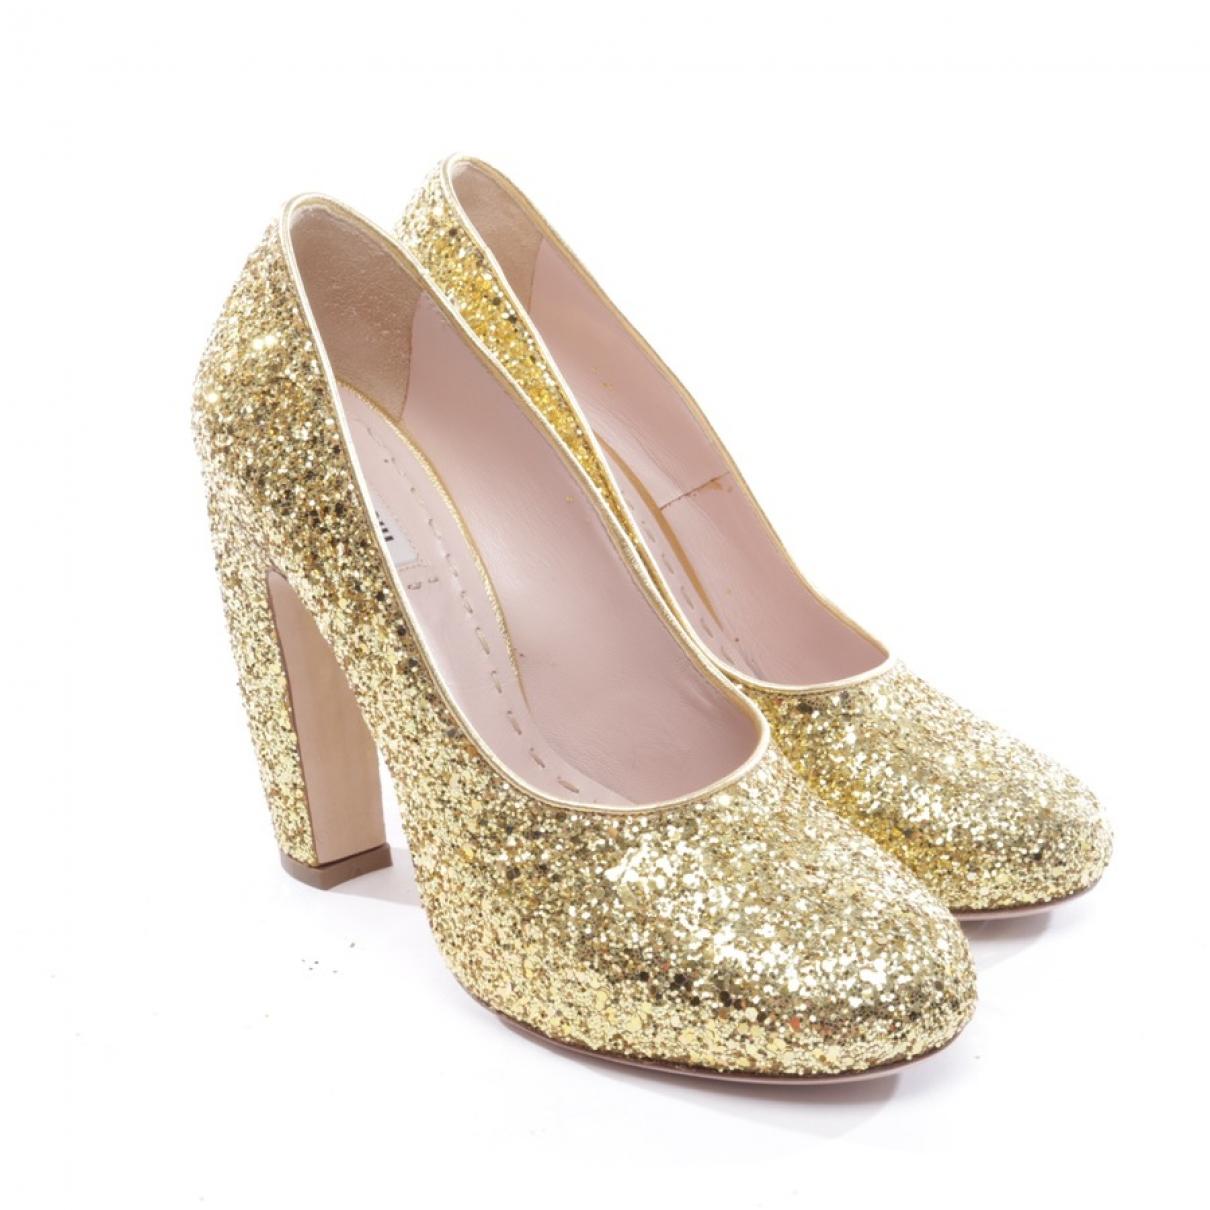 Miu Miu \N Metallic Leather Heels for Women 39 EU